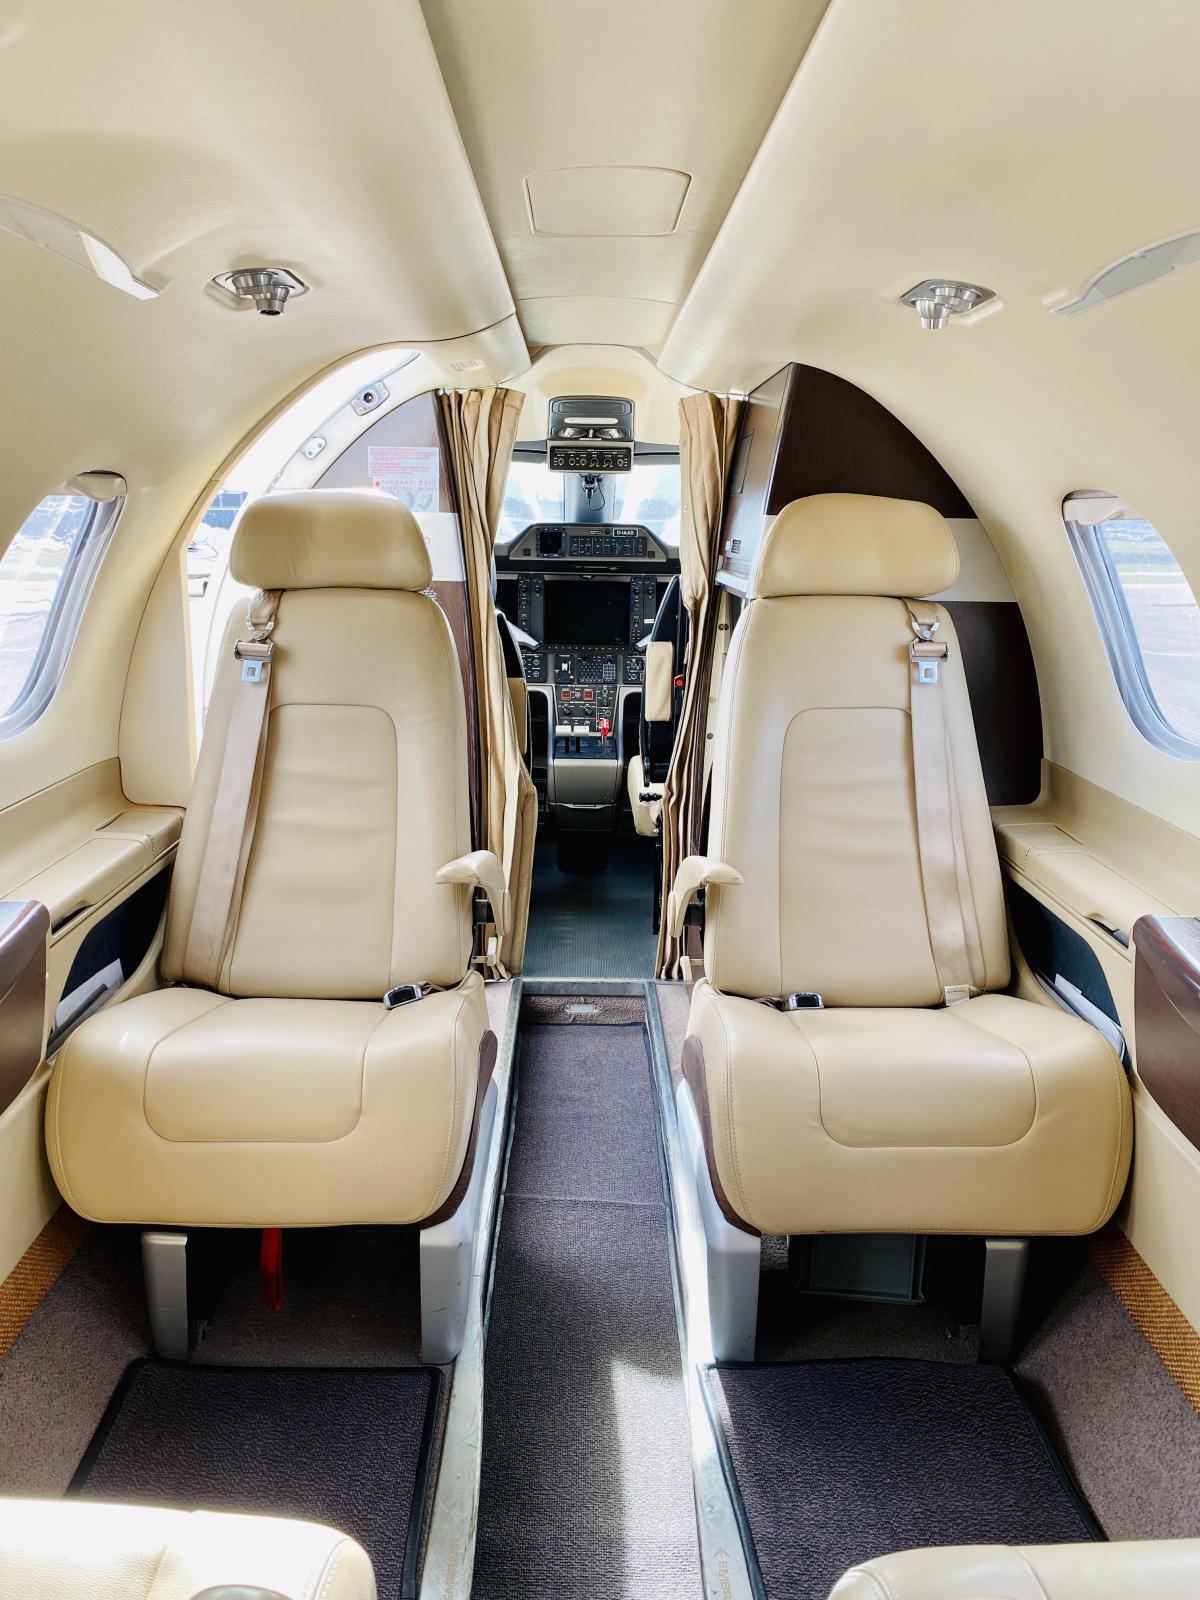 2011 Embraer Phenom 100 Photo 5